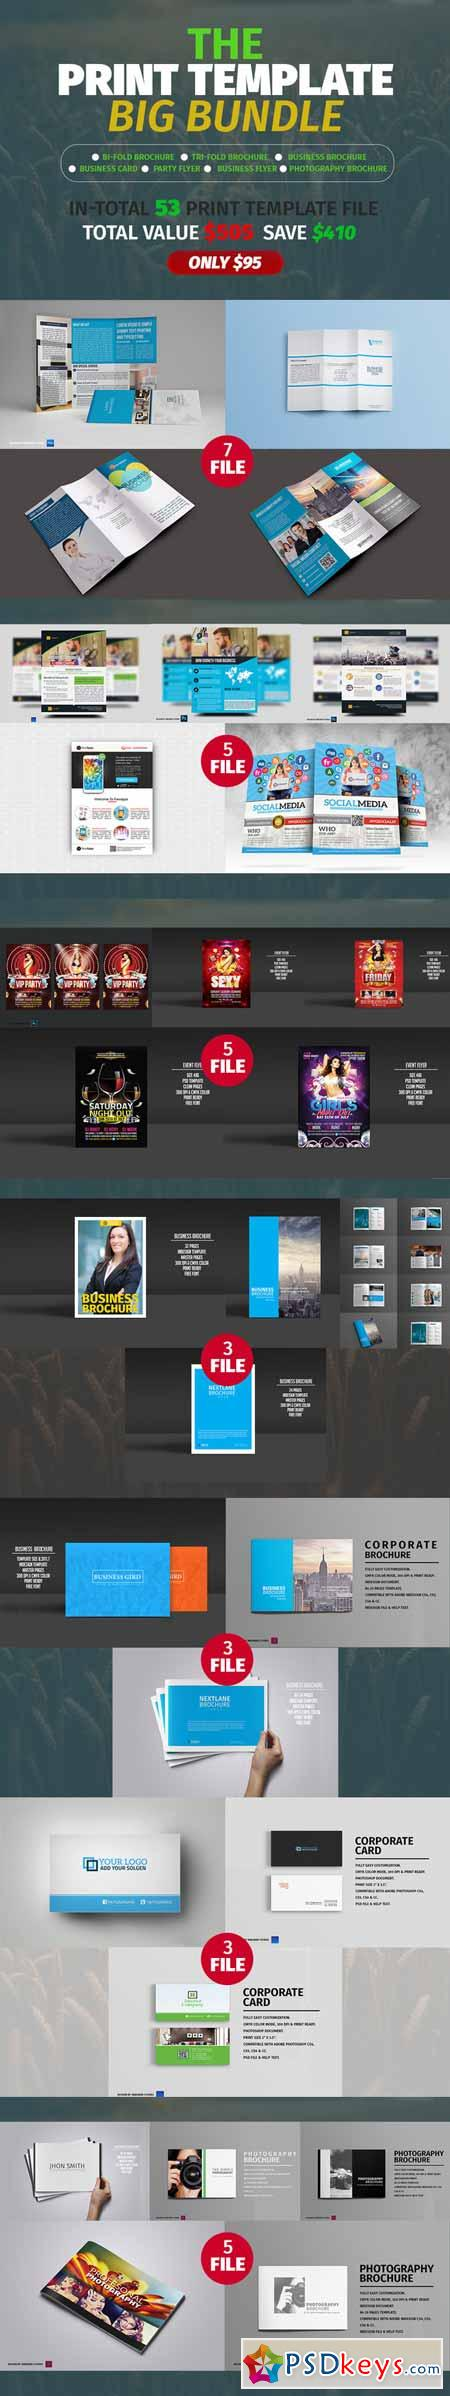 The Print Template Big Bundle 365649